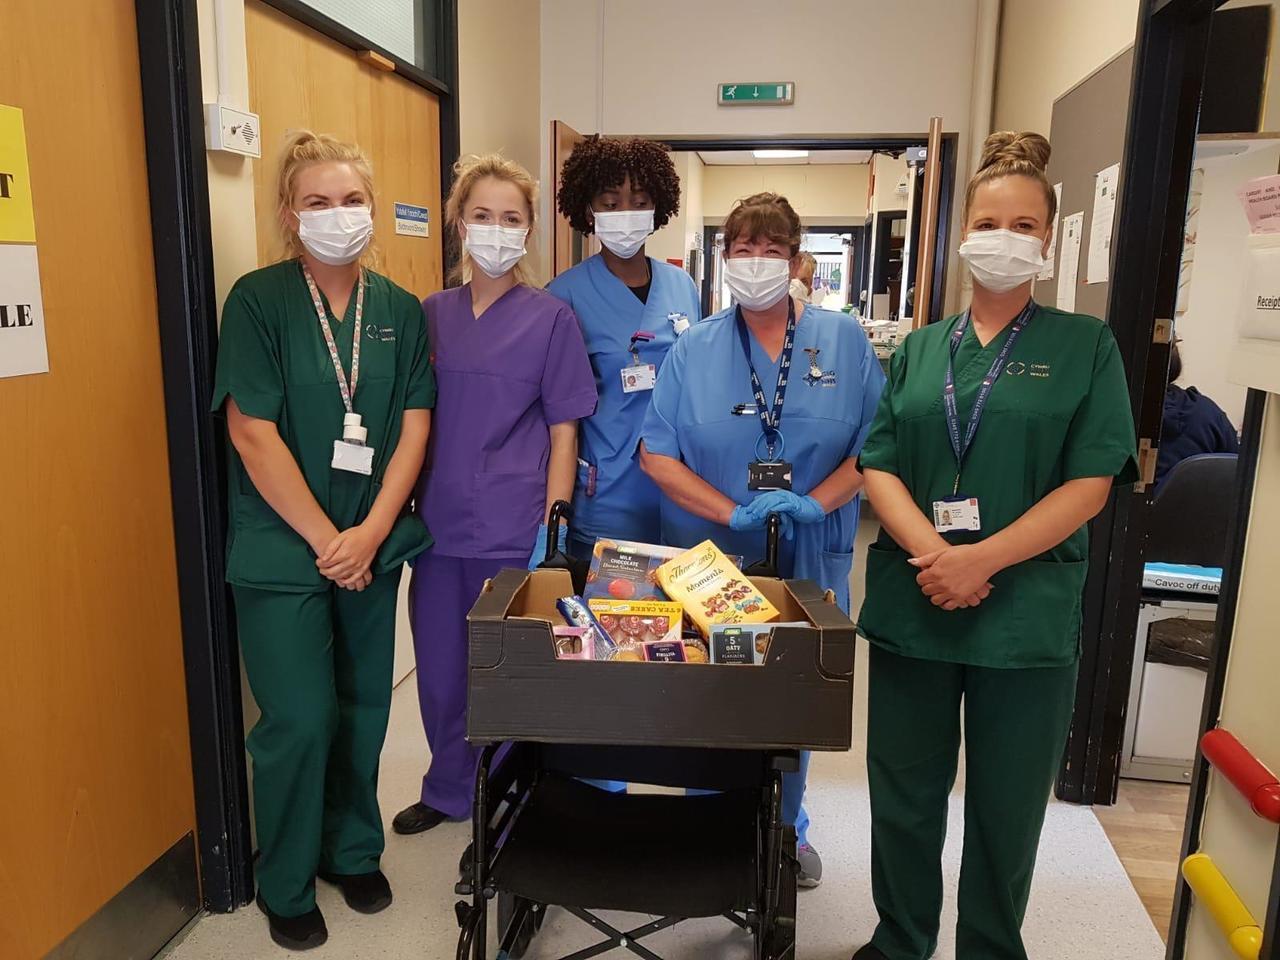 Hospital donation | Asda Cardiff Bay